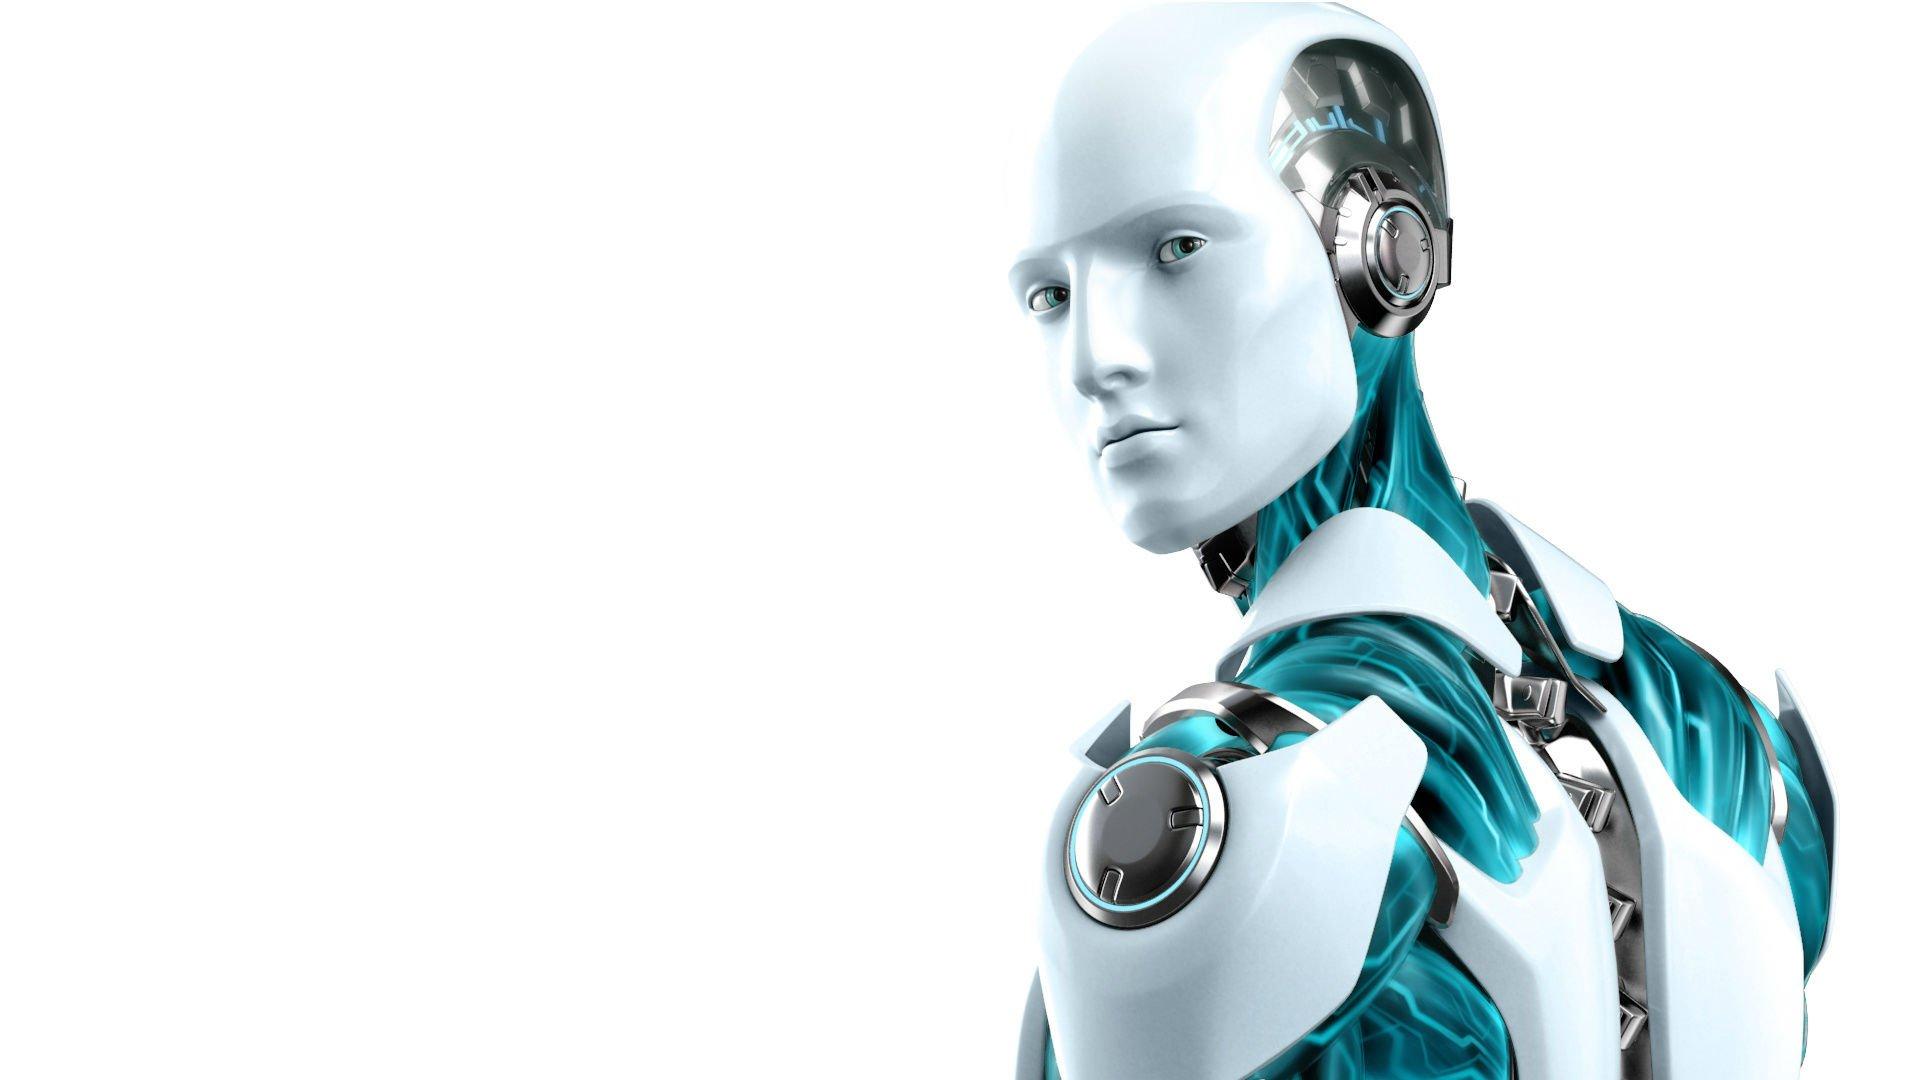 I-ROBOT action mystery sci-fi futuristic robot technics ...